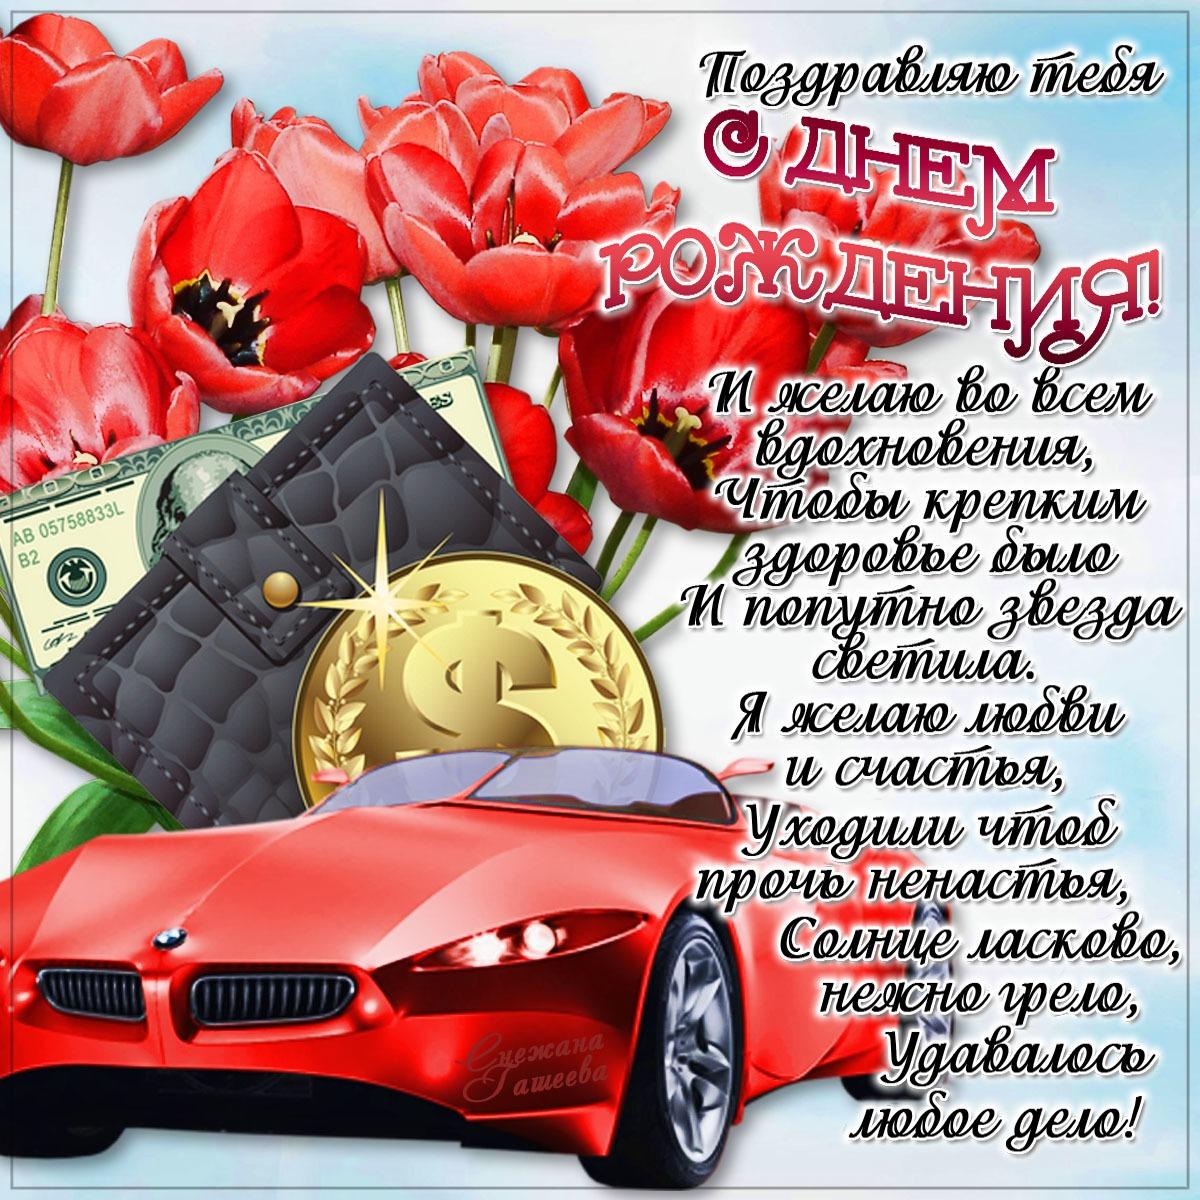 http://www.asienda.ru/data/cache/2015nov/05/04/352378_93022.jpg